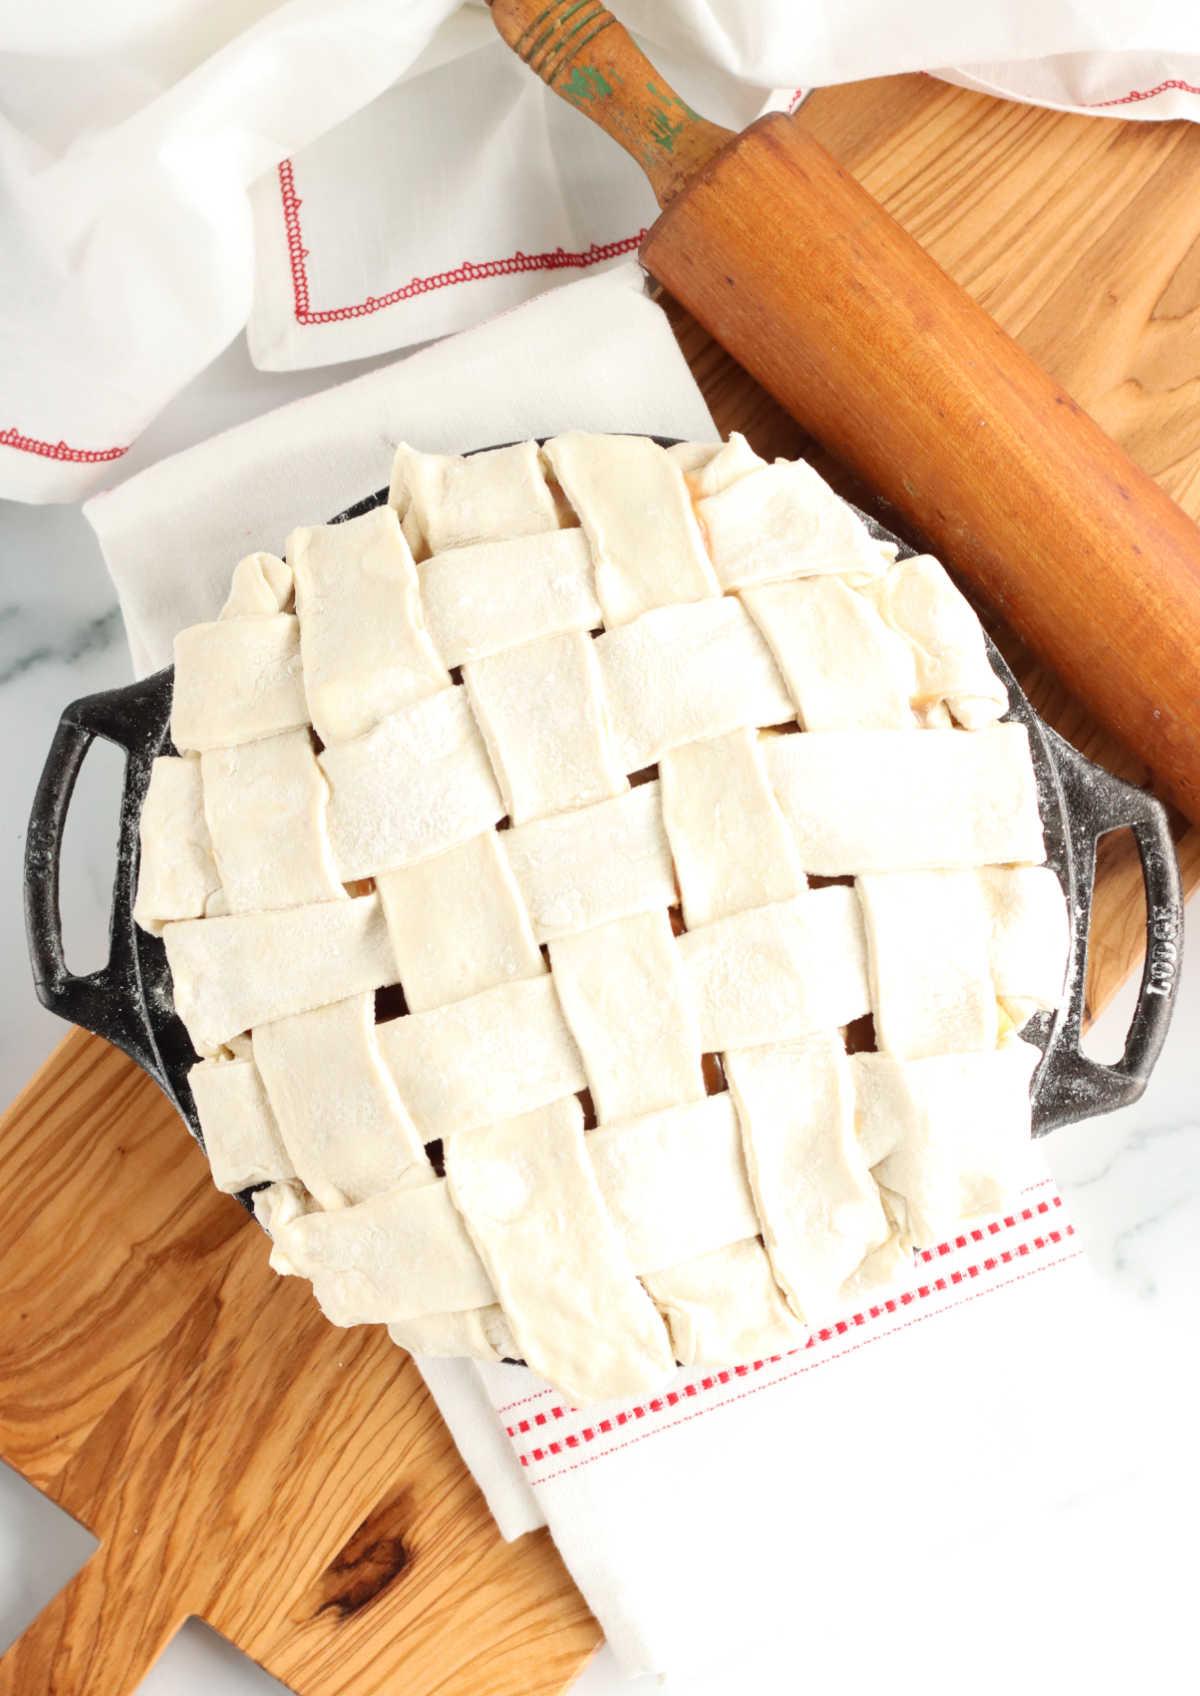 unbaked pie in cast iron pie plate with lattice crust.